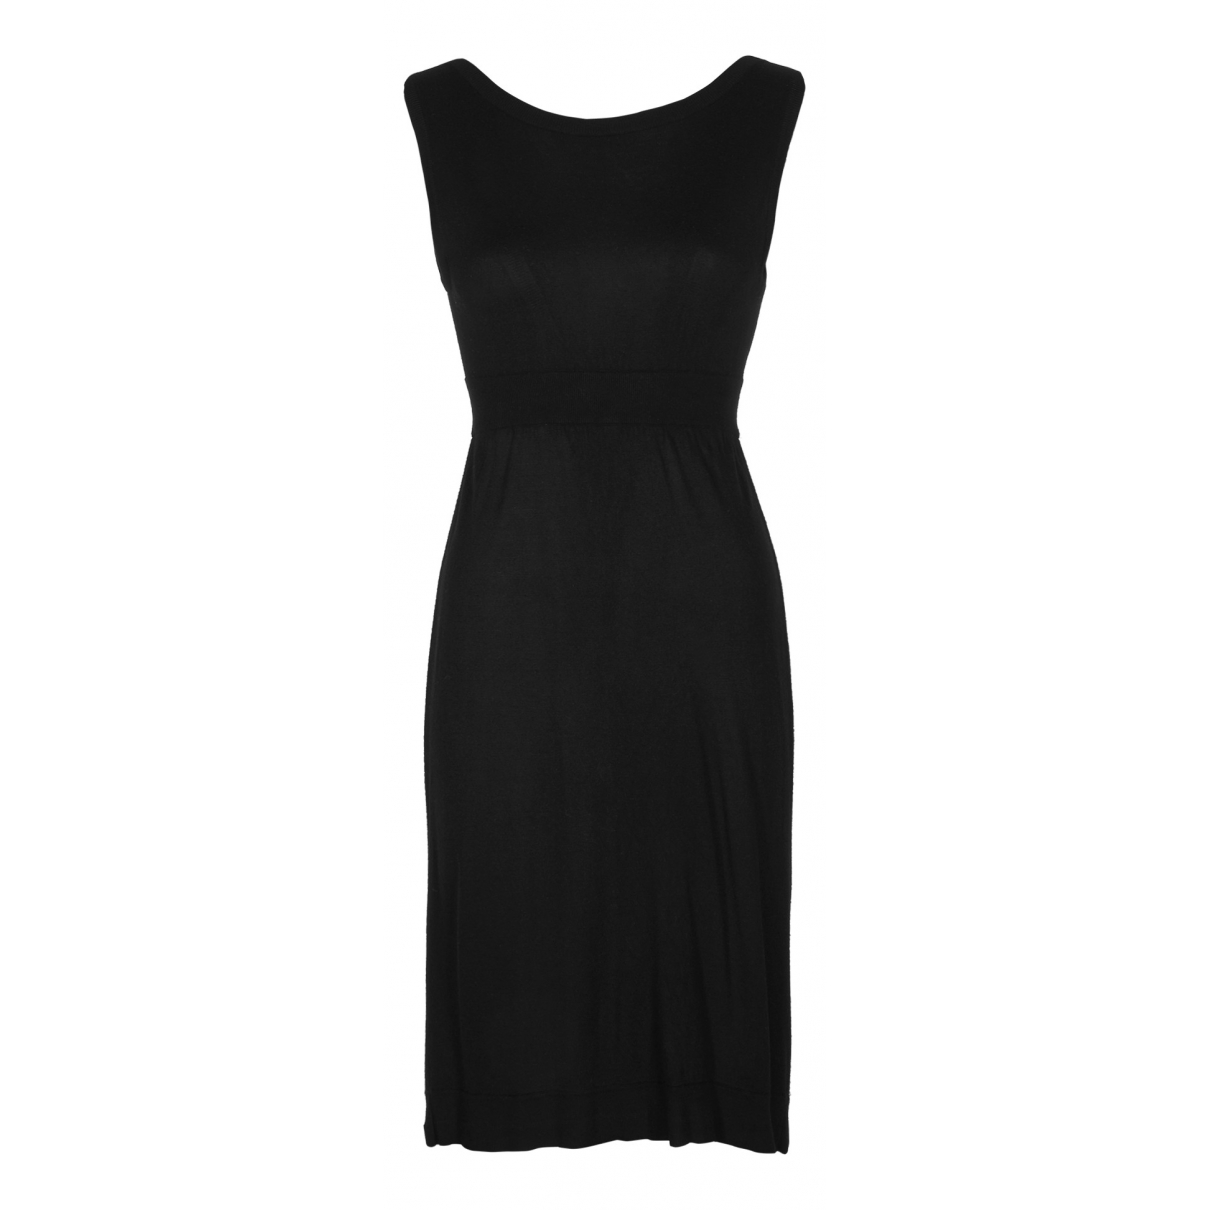 Alexander Mcqueen N Black Cashmere dress for Women S International